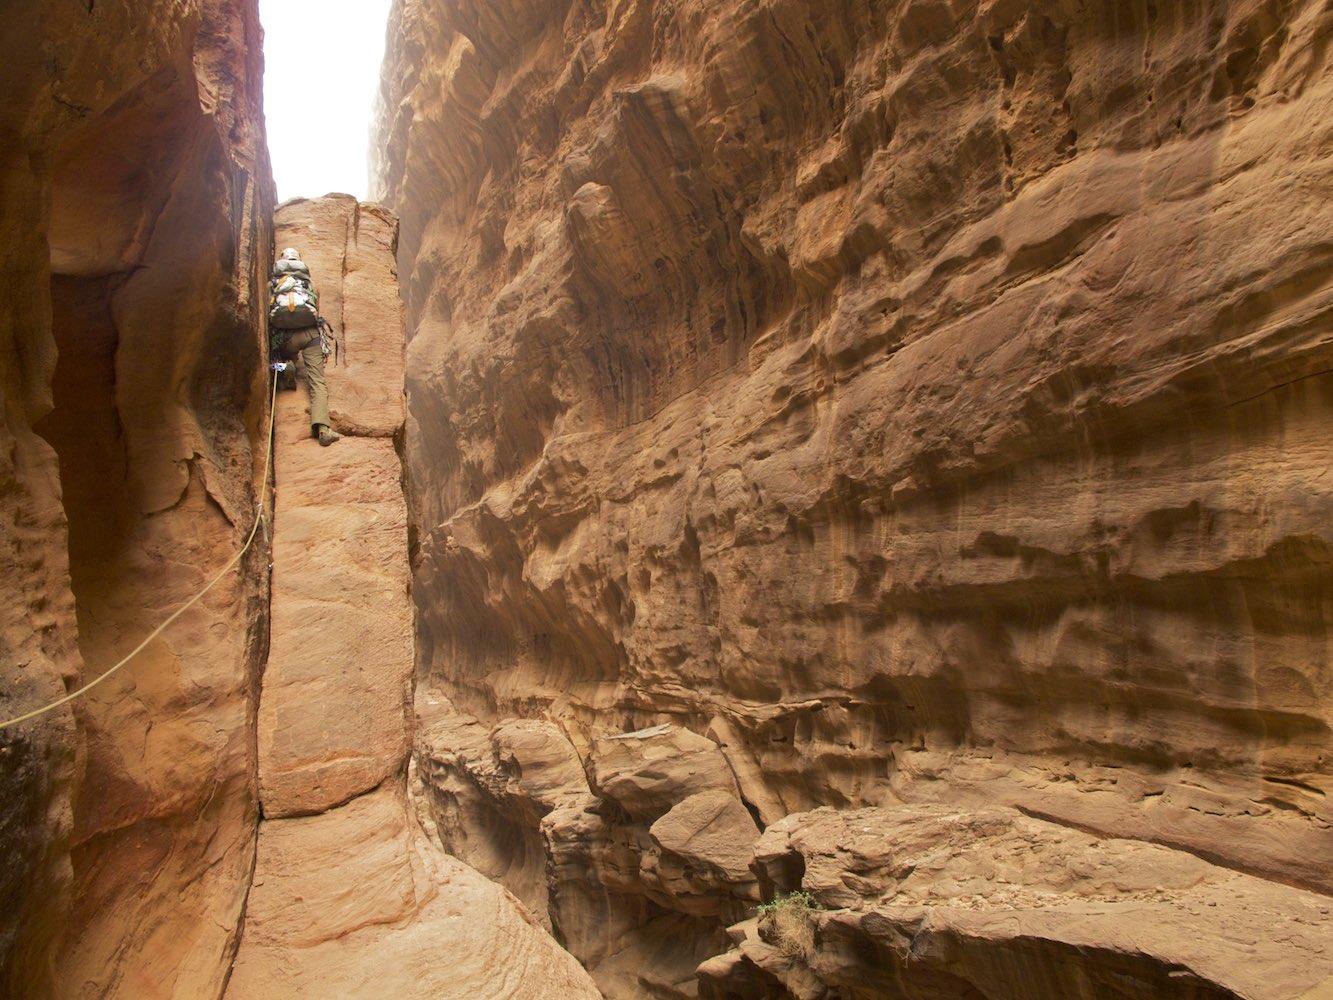 Going through the long Abu Iglakhat Canyon